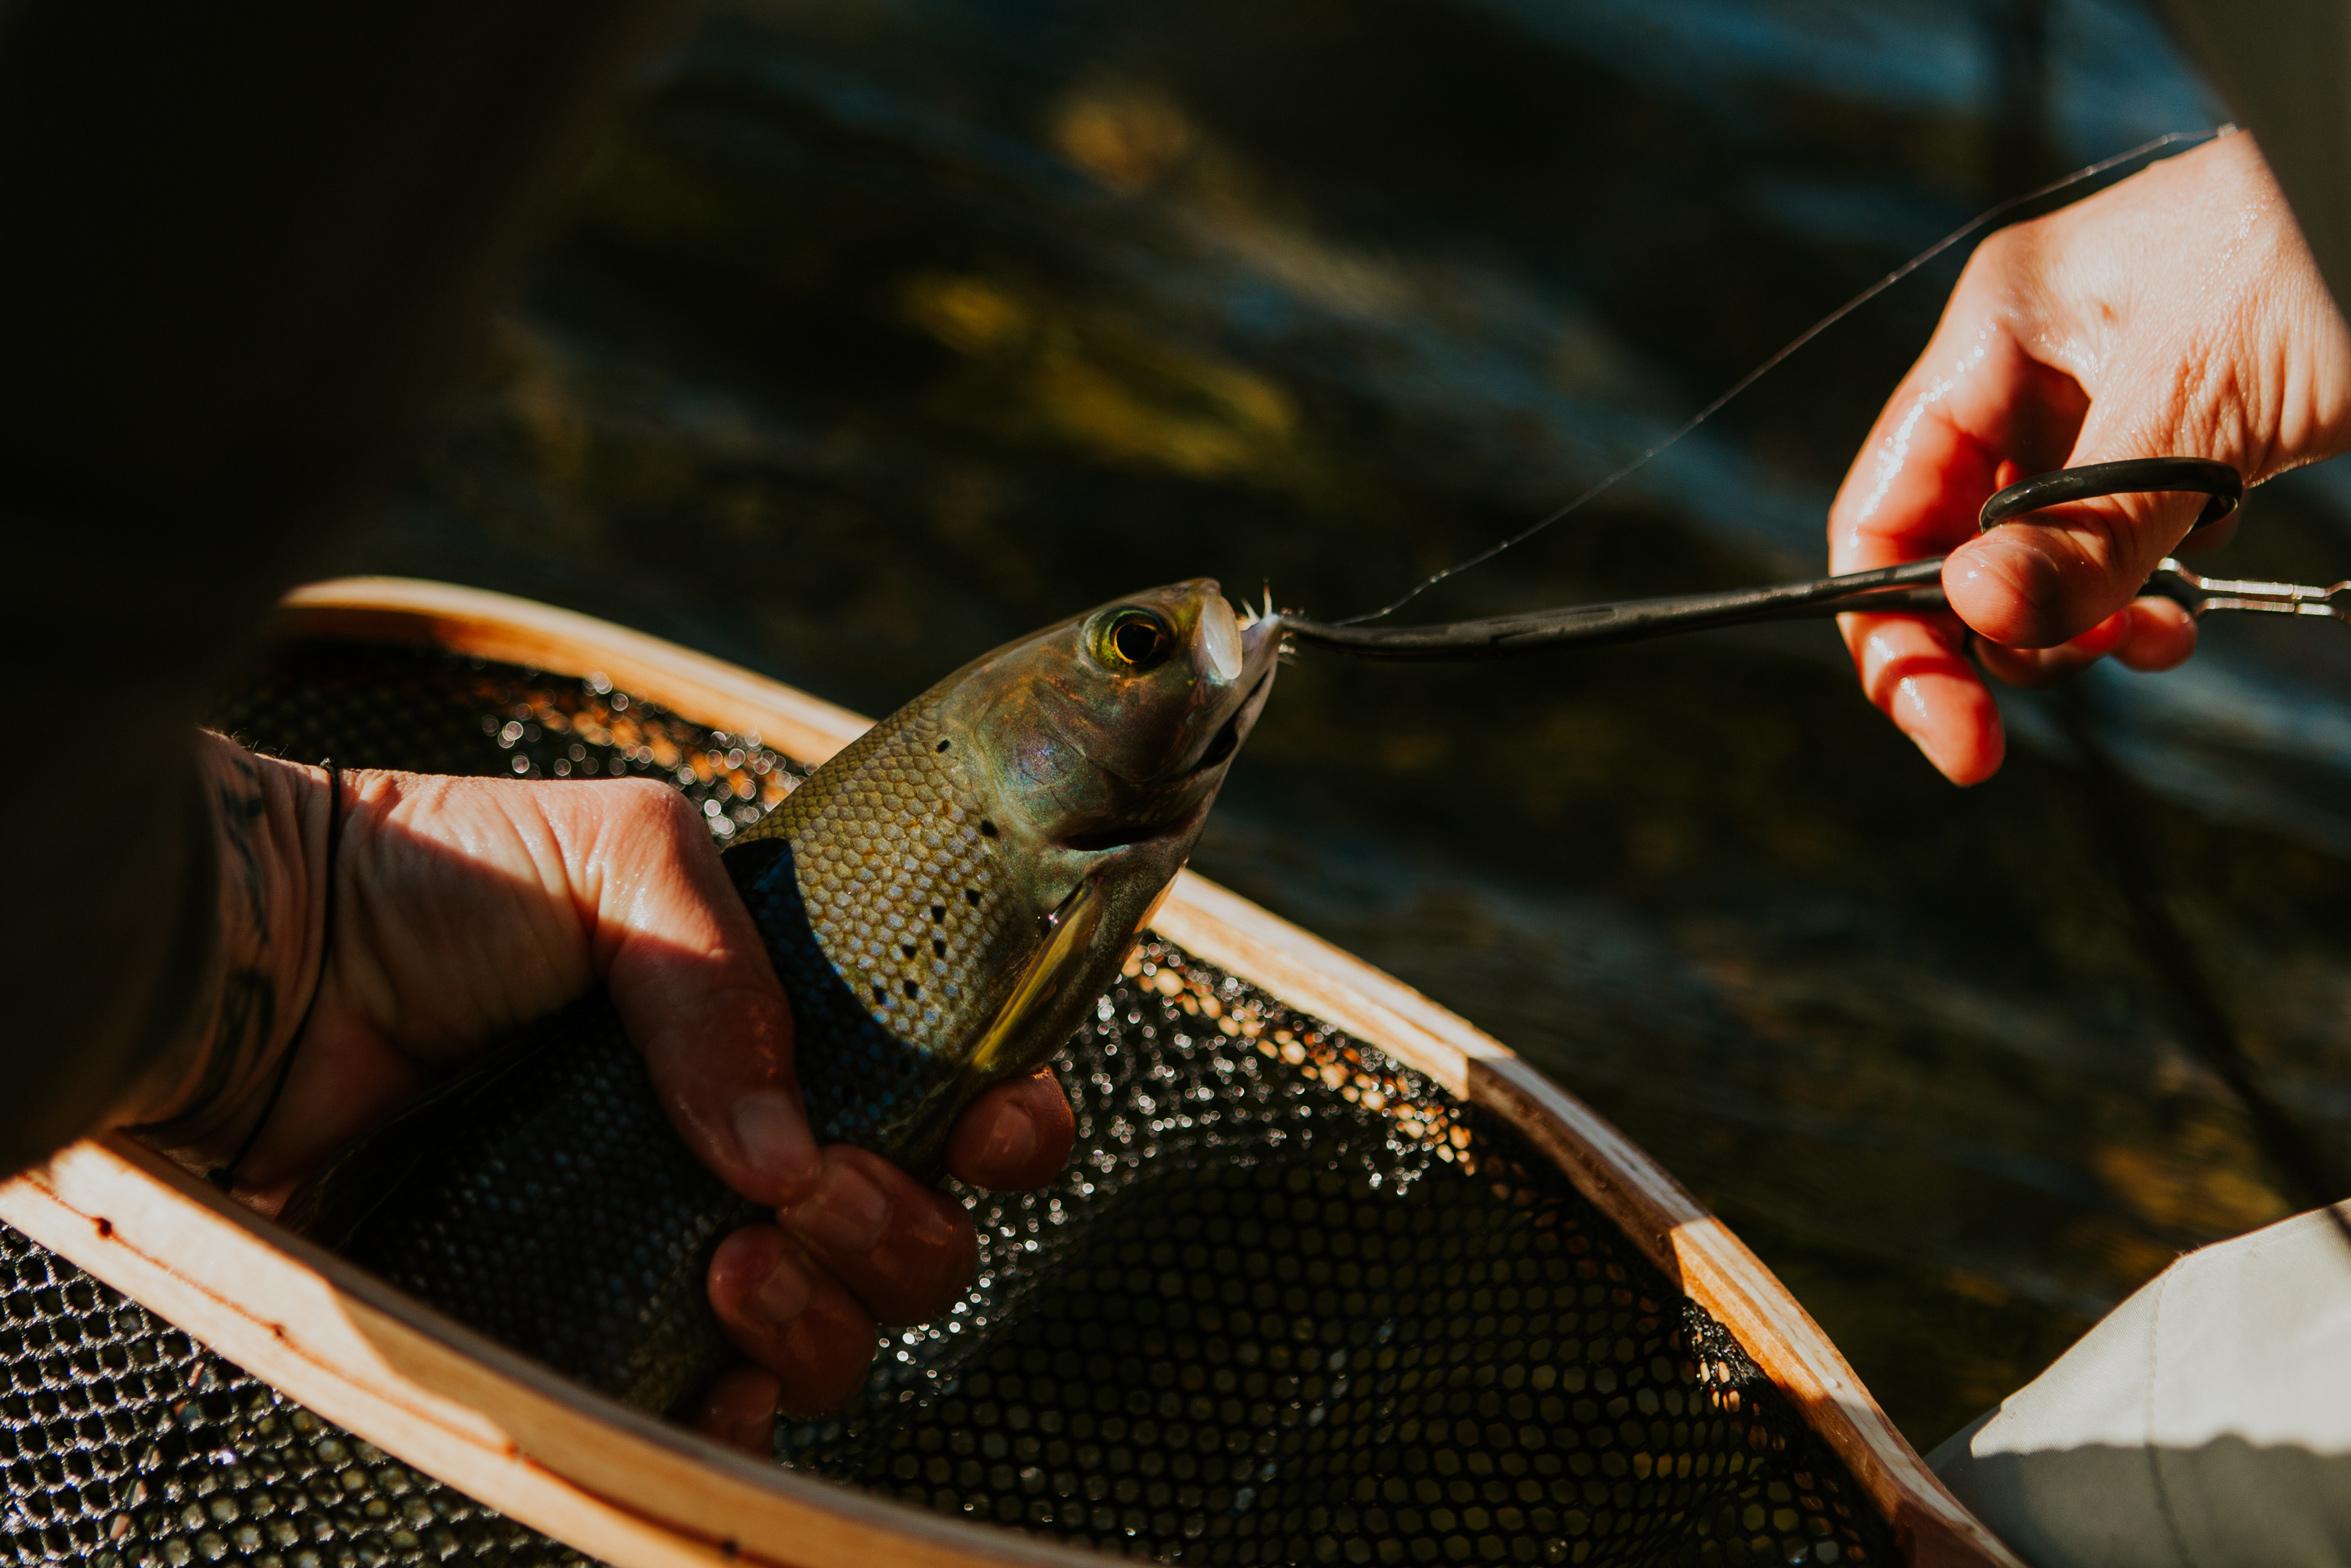 CindyGiovagnoli_Alaska_KoyukukRiver_SukakpakMountain_JimRiver_ArcticCircle_fly_fishing_September-069.jpg